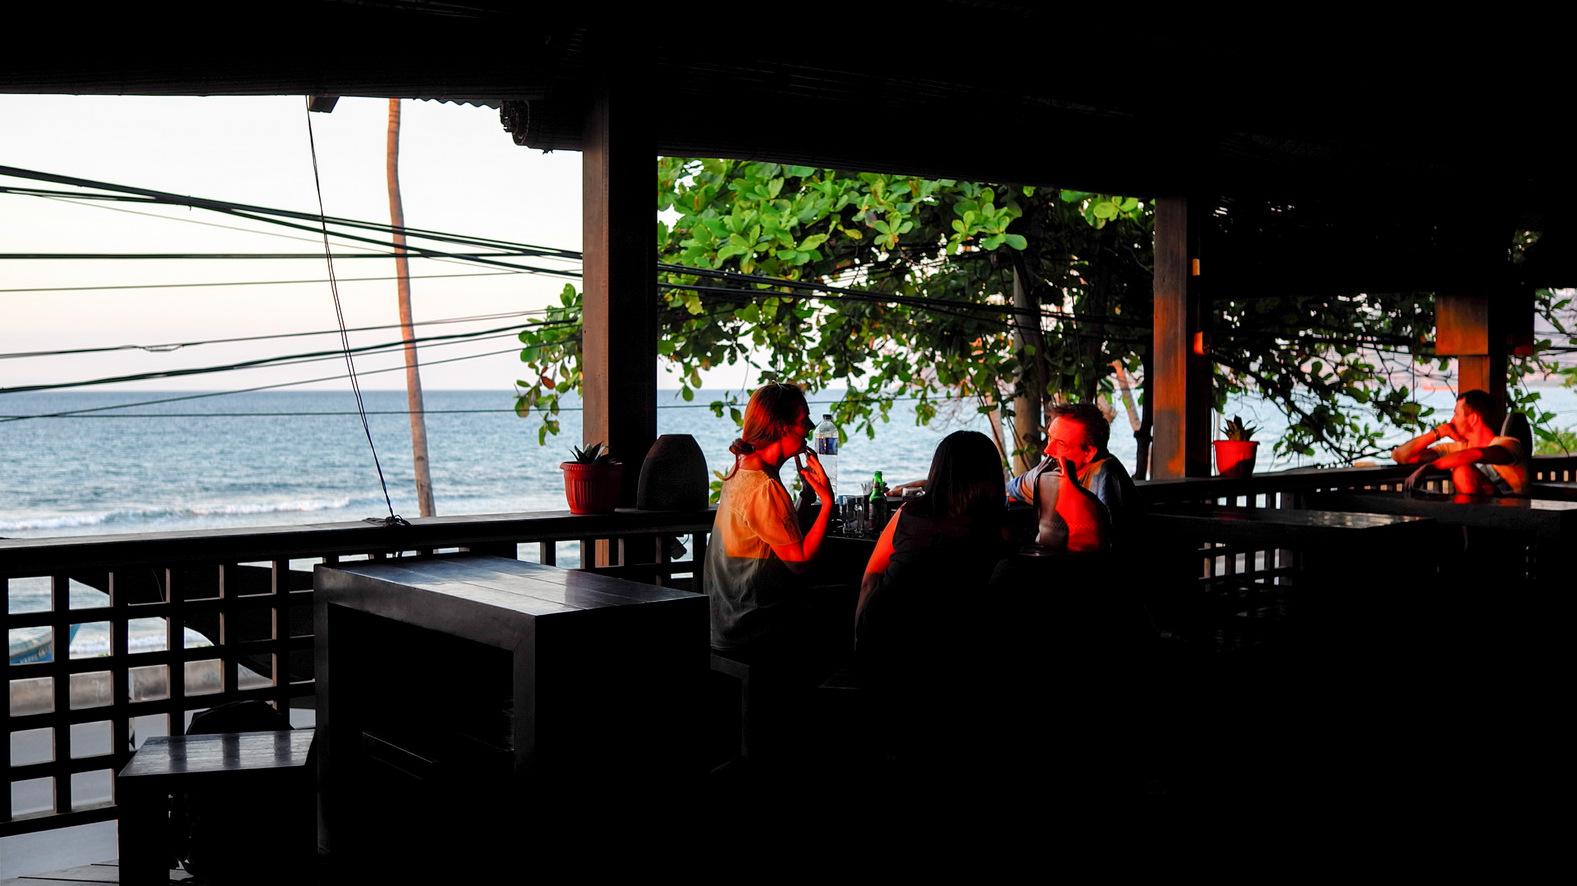 Hotel Esplanada Restaurant, Dili, Timor-Leste